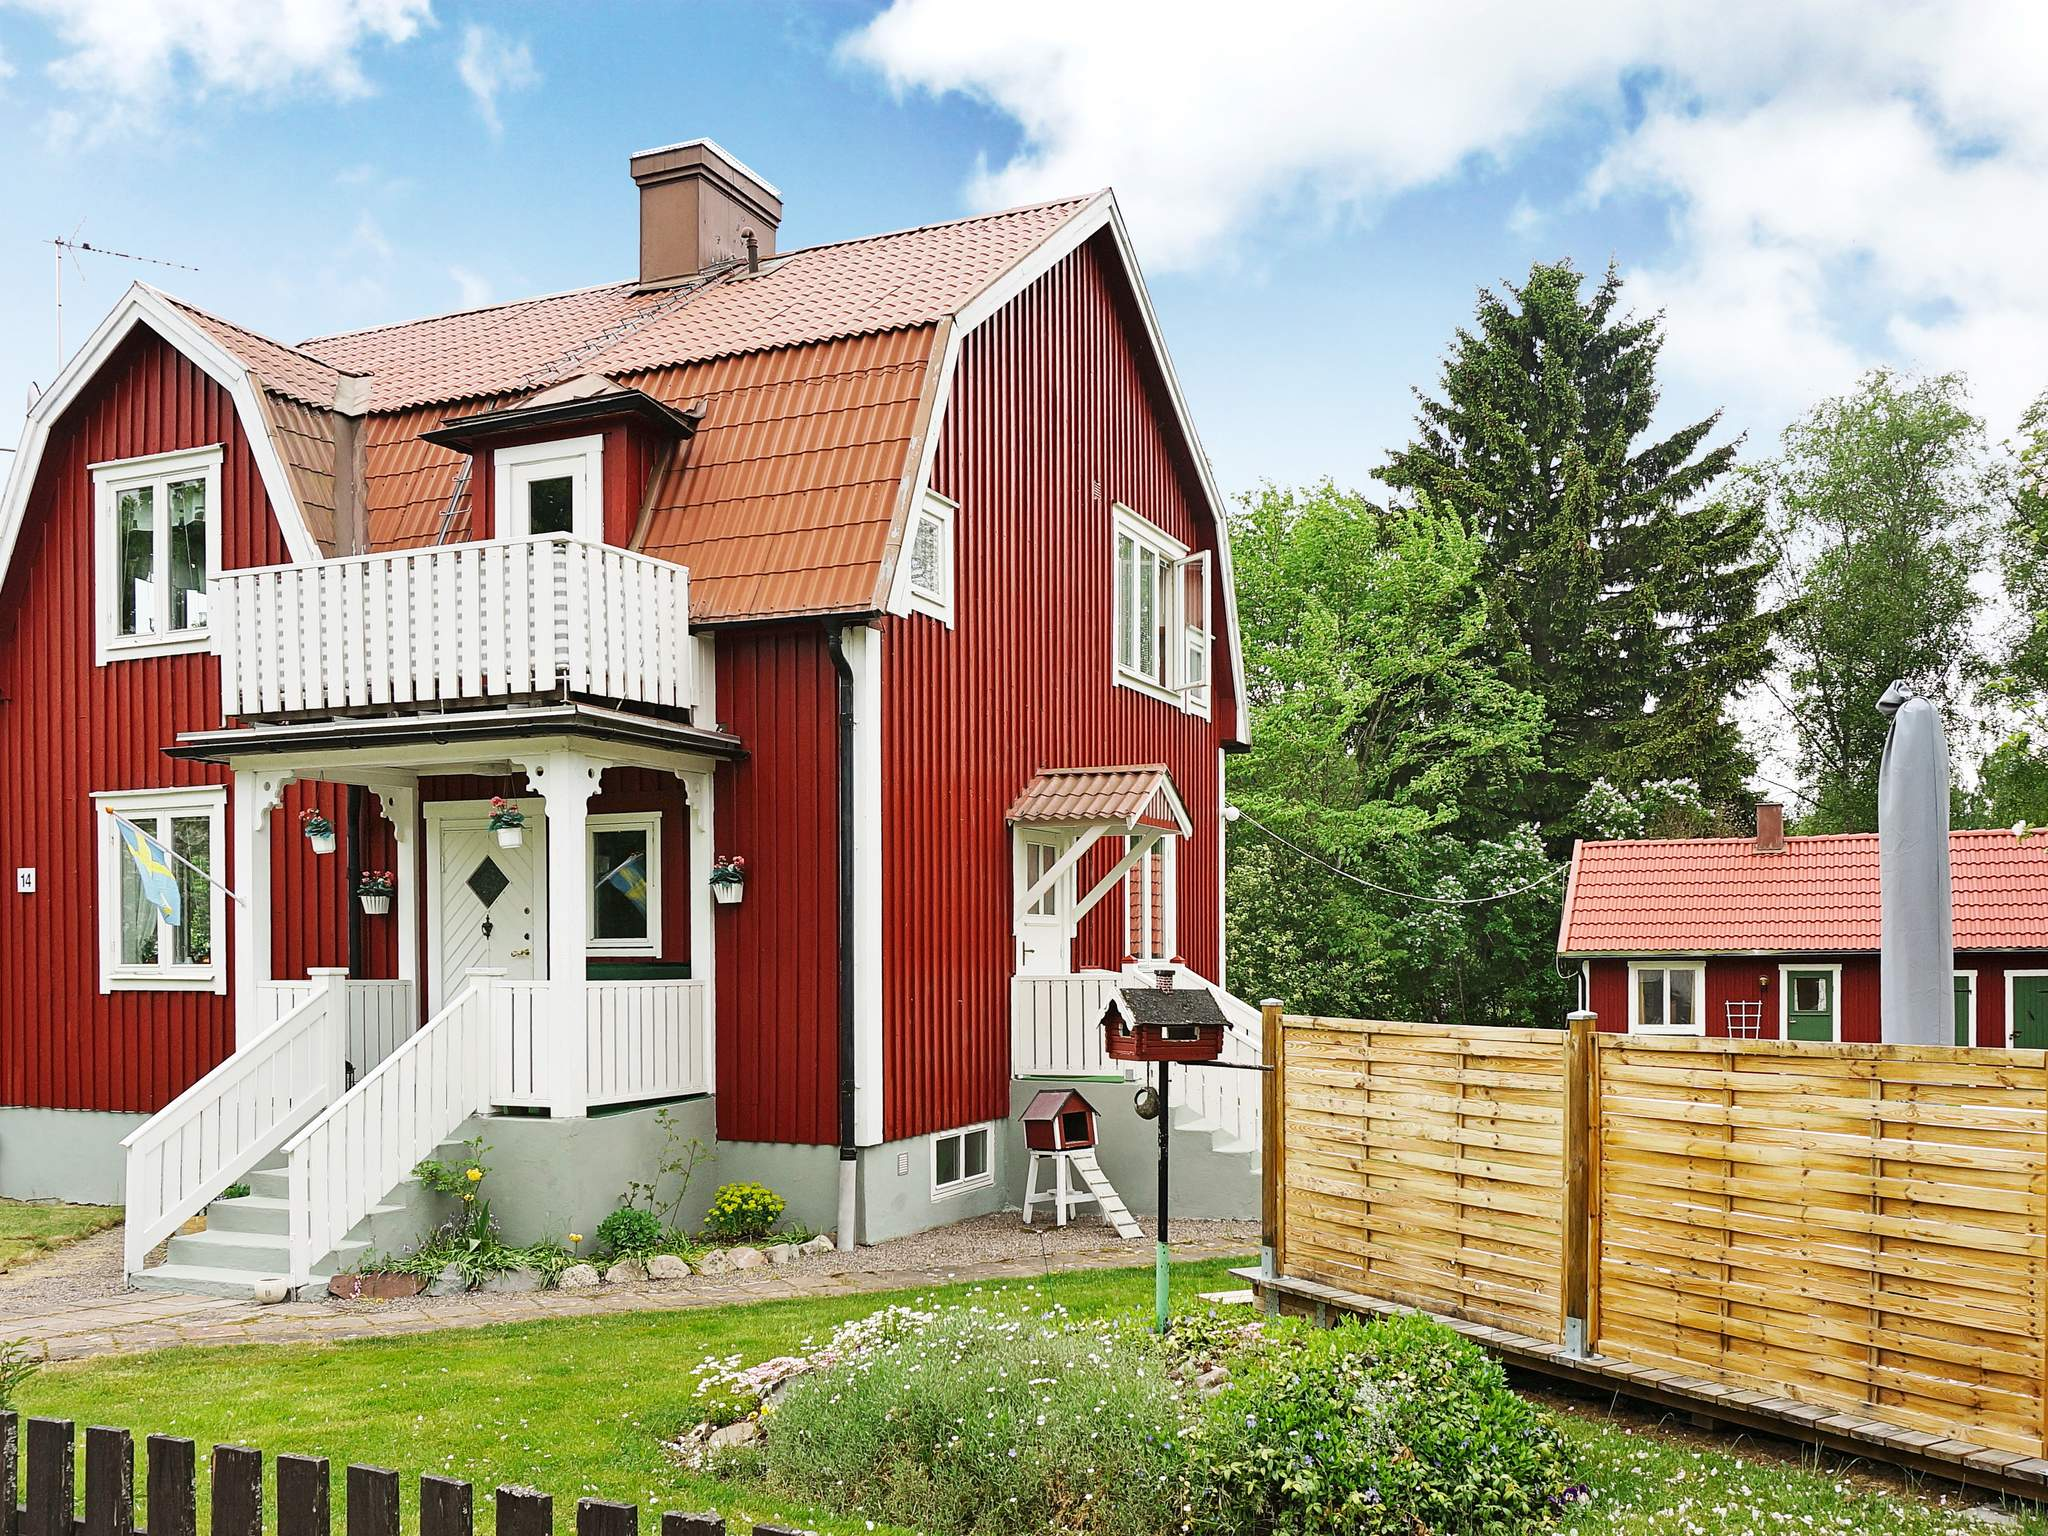 Ferienhaus Sandsjöfors (418764), Sandsjöfors, Jönköpings län, Südschweden, Schweden, Bild 15